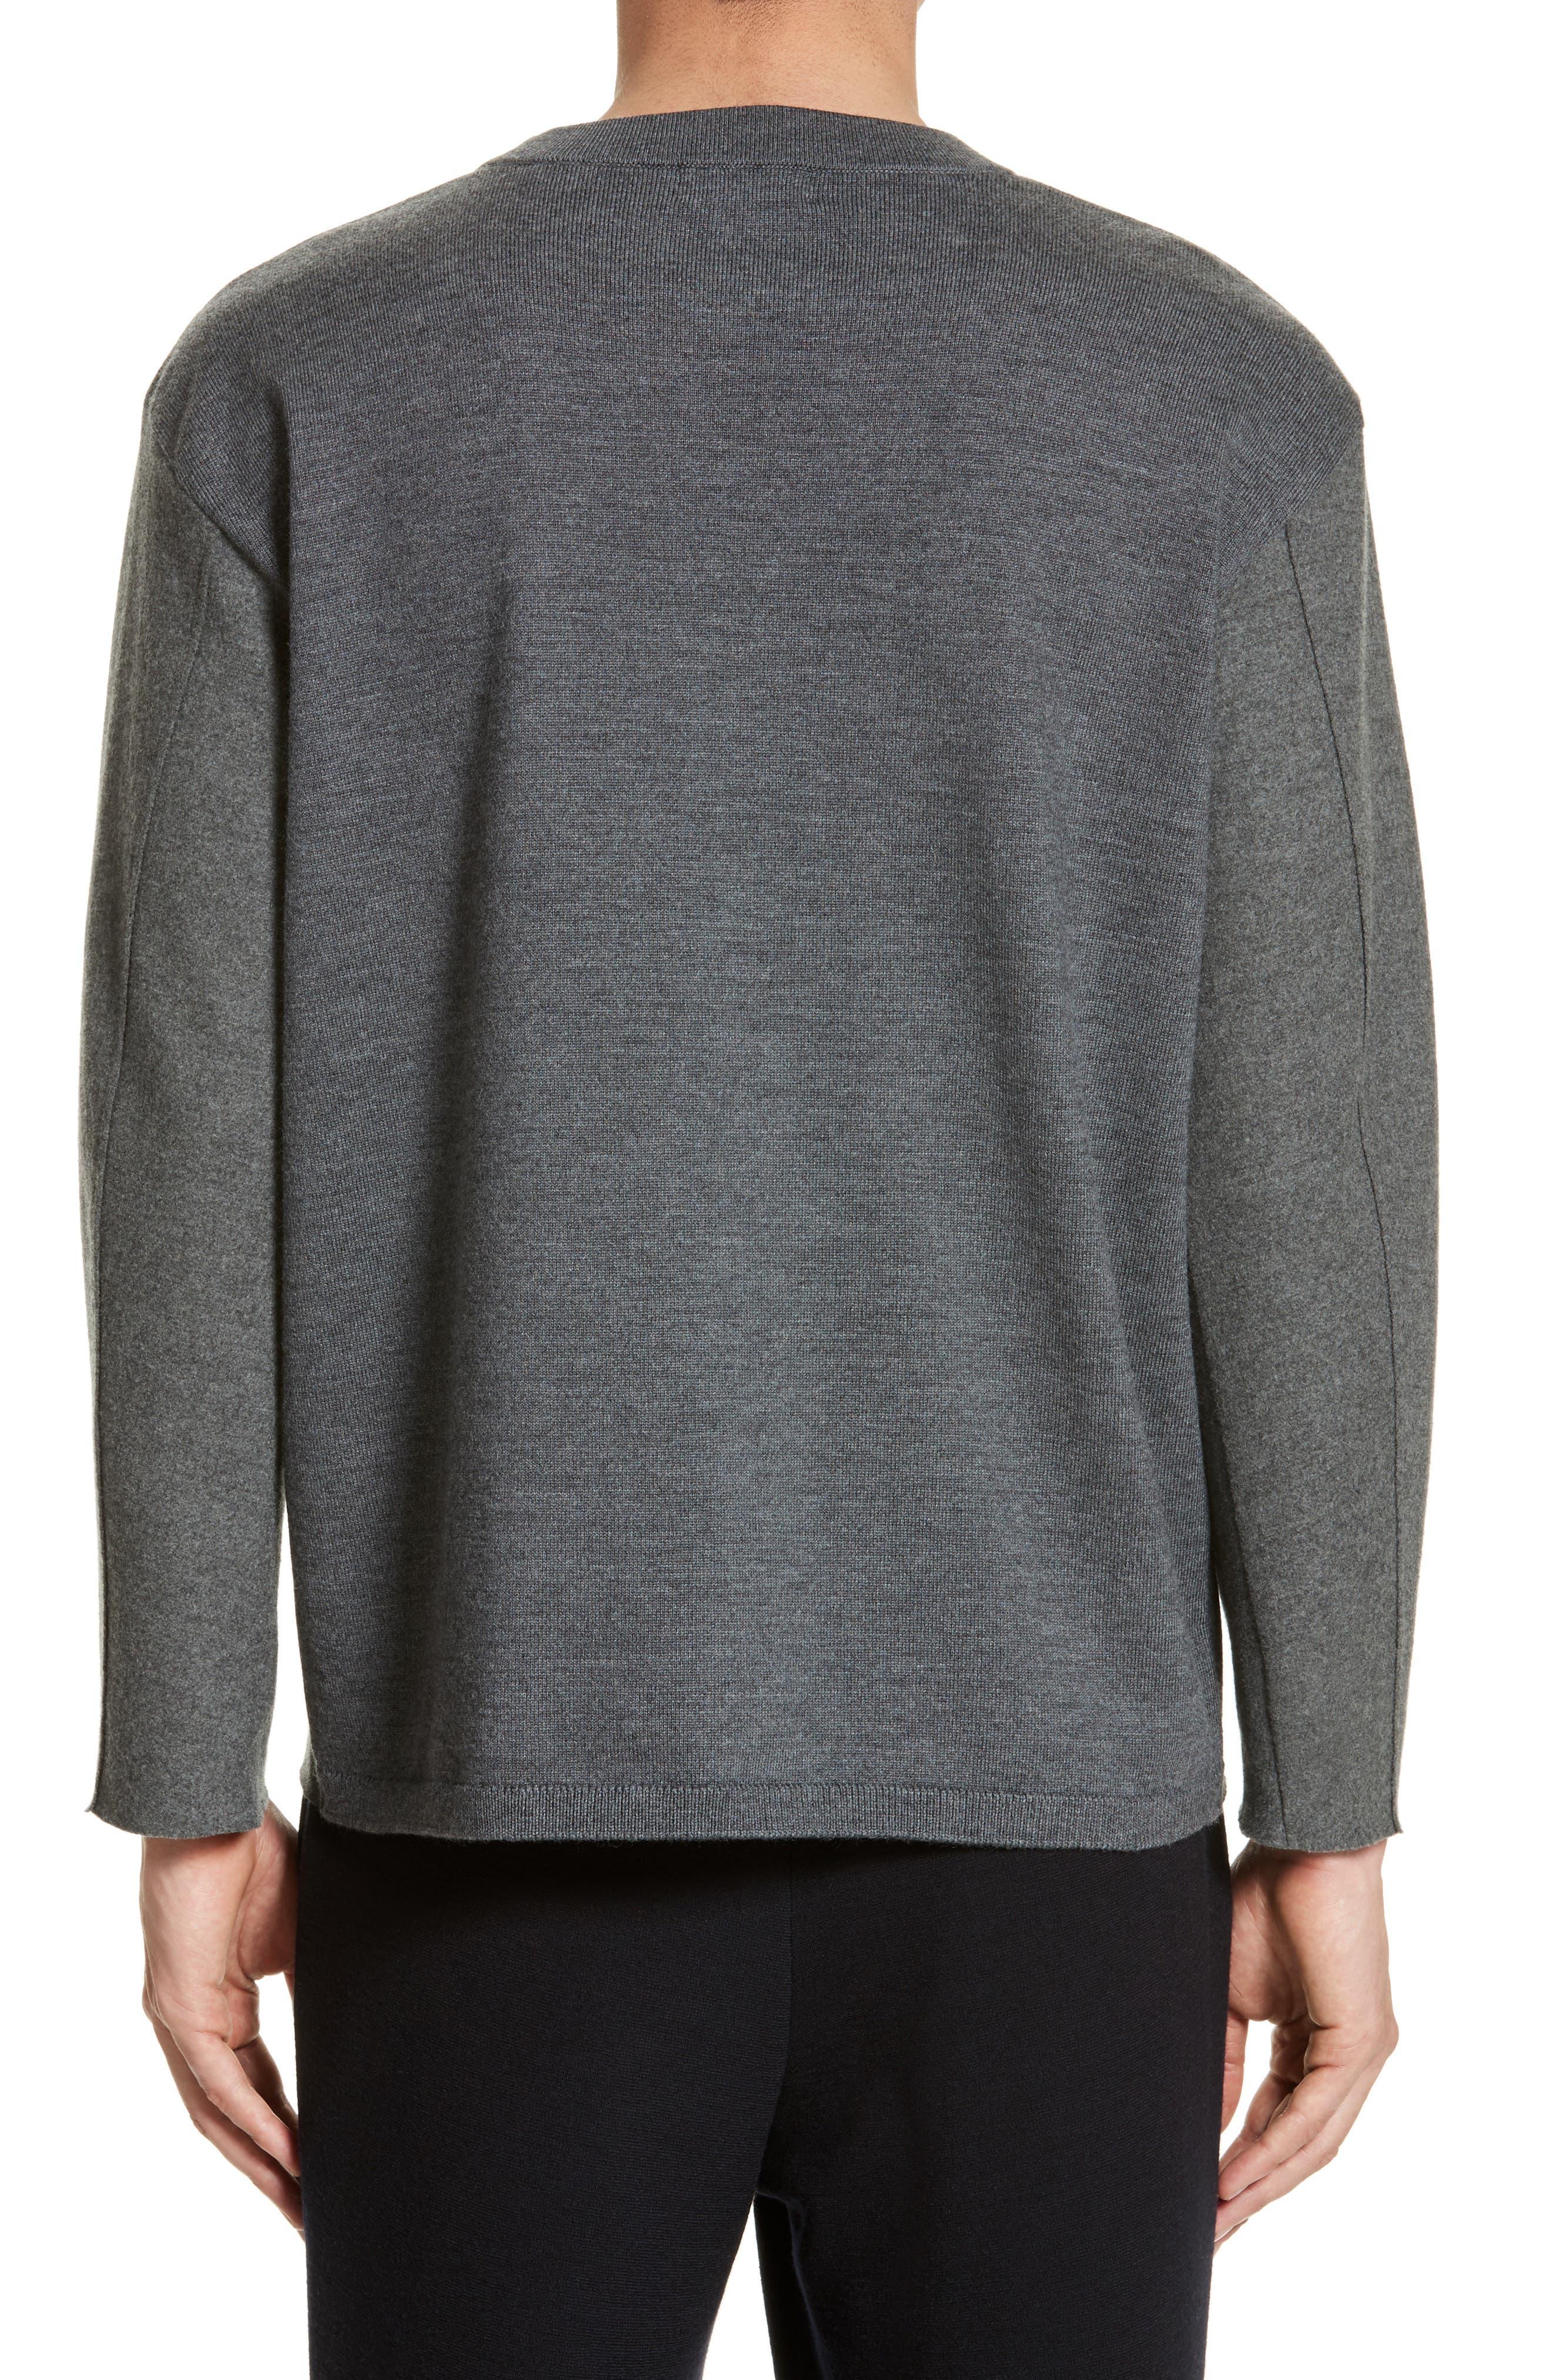 Hyper Compress Sweatshirt,                             Alternate thumbnail 2, color,